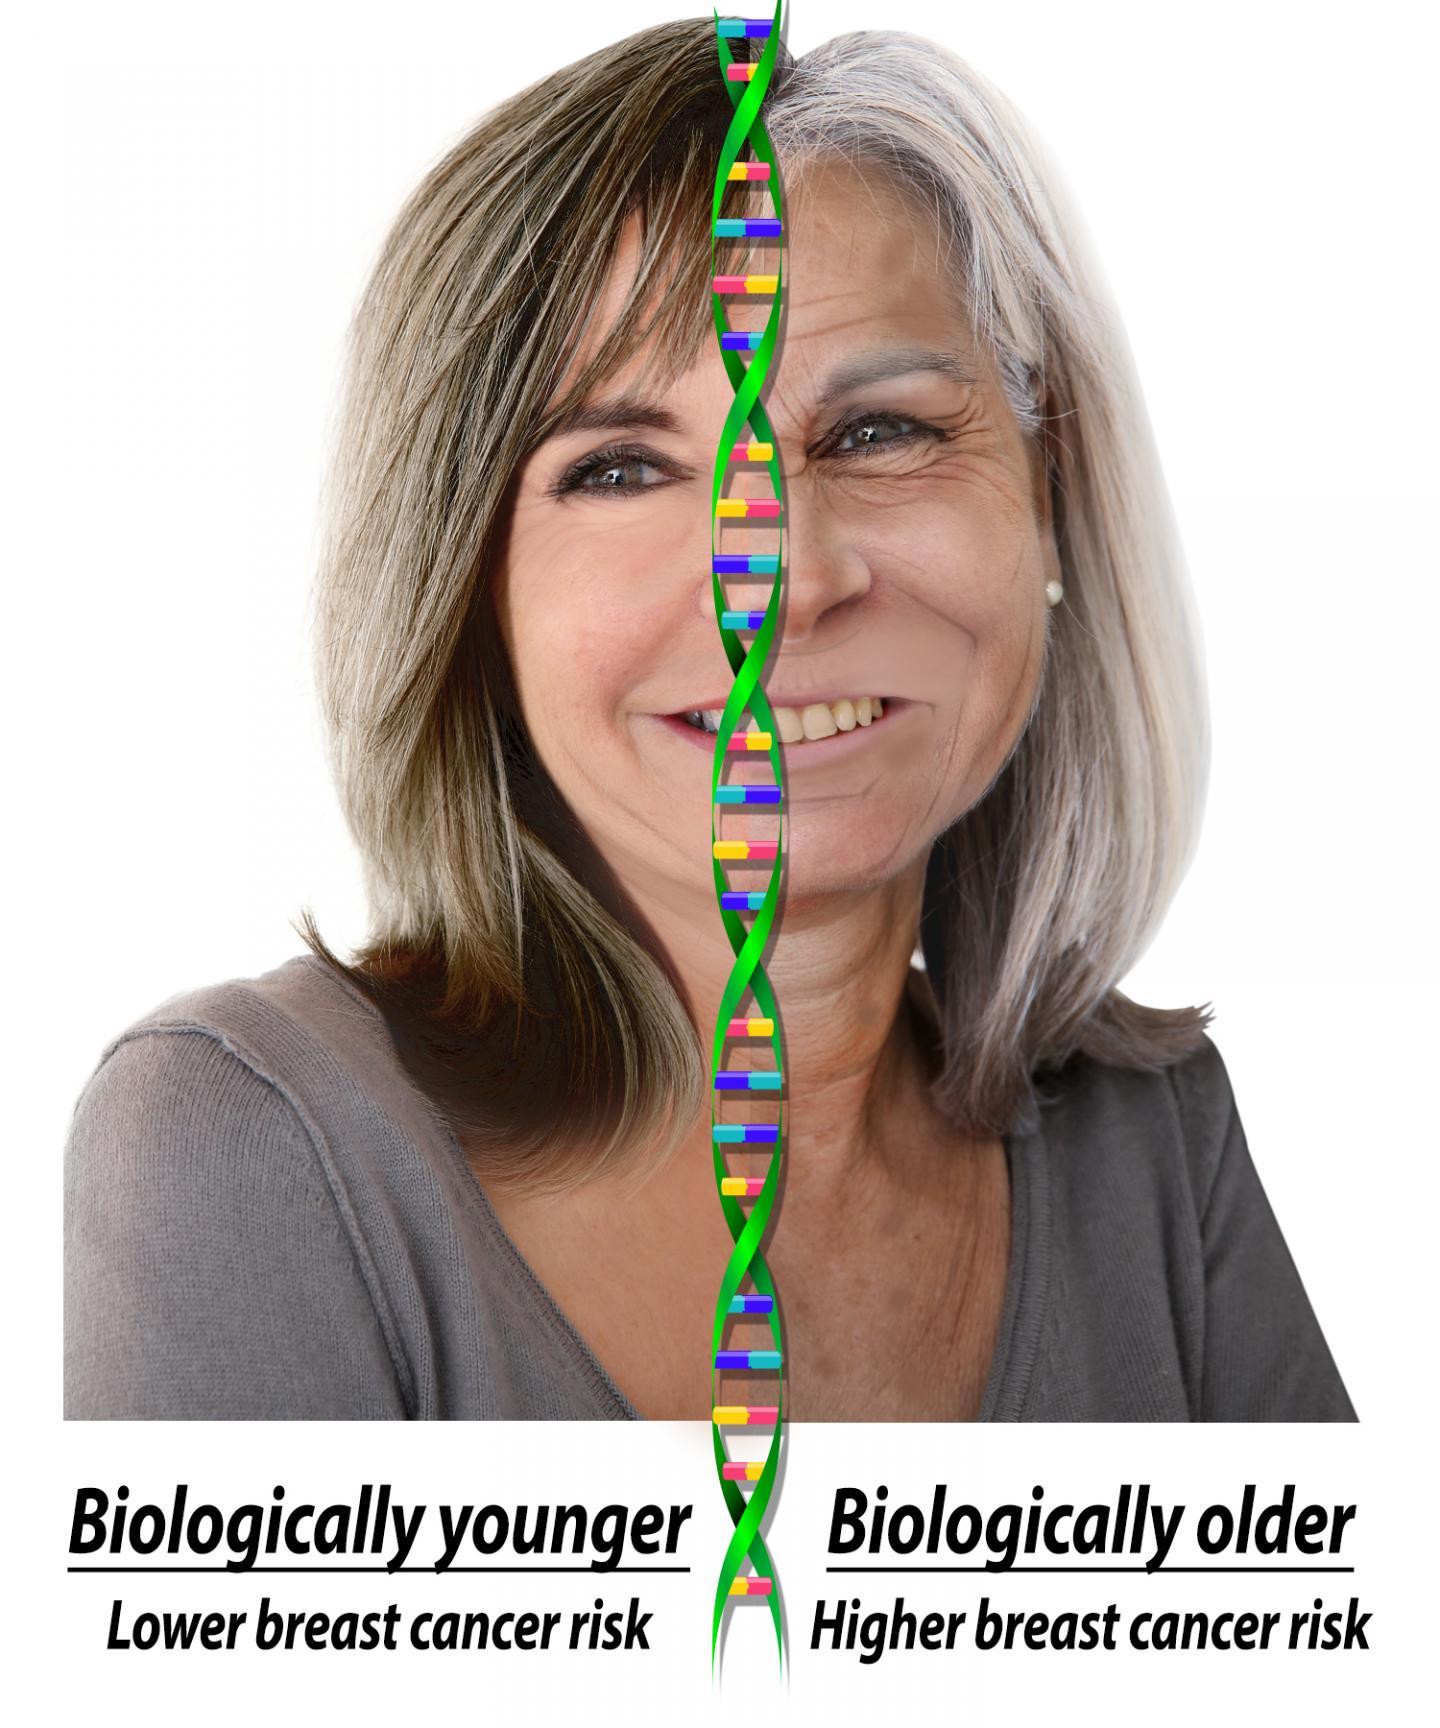 Jewish women over 50 years old